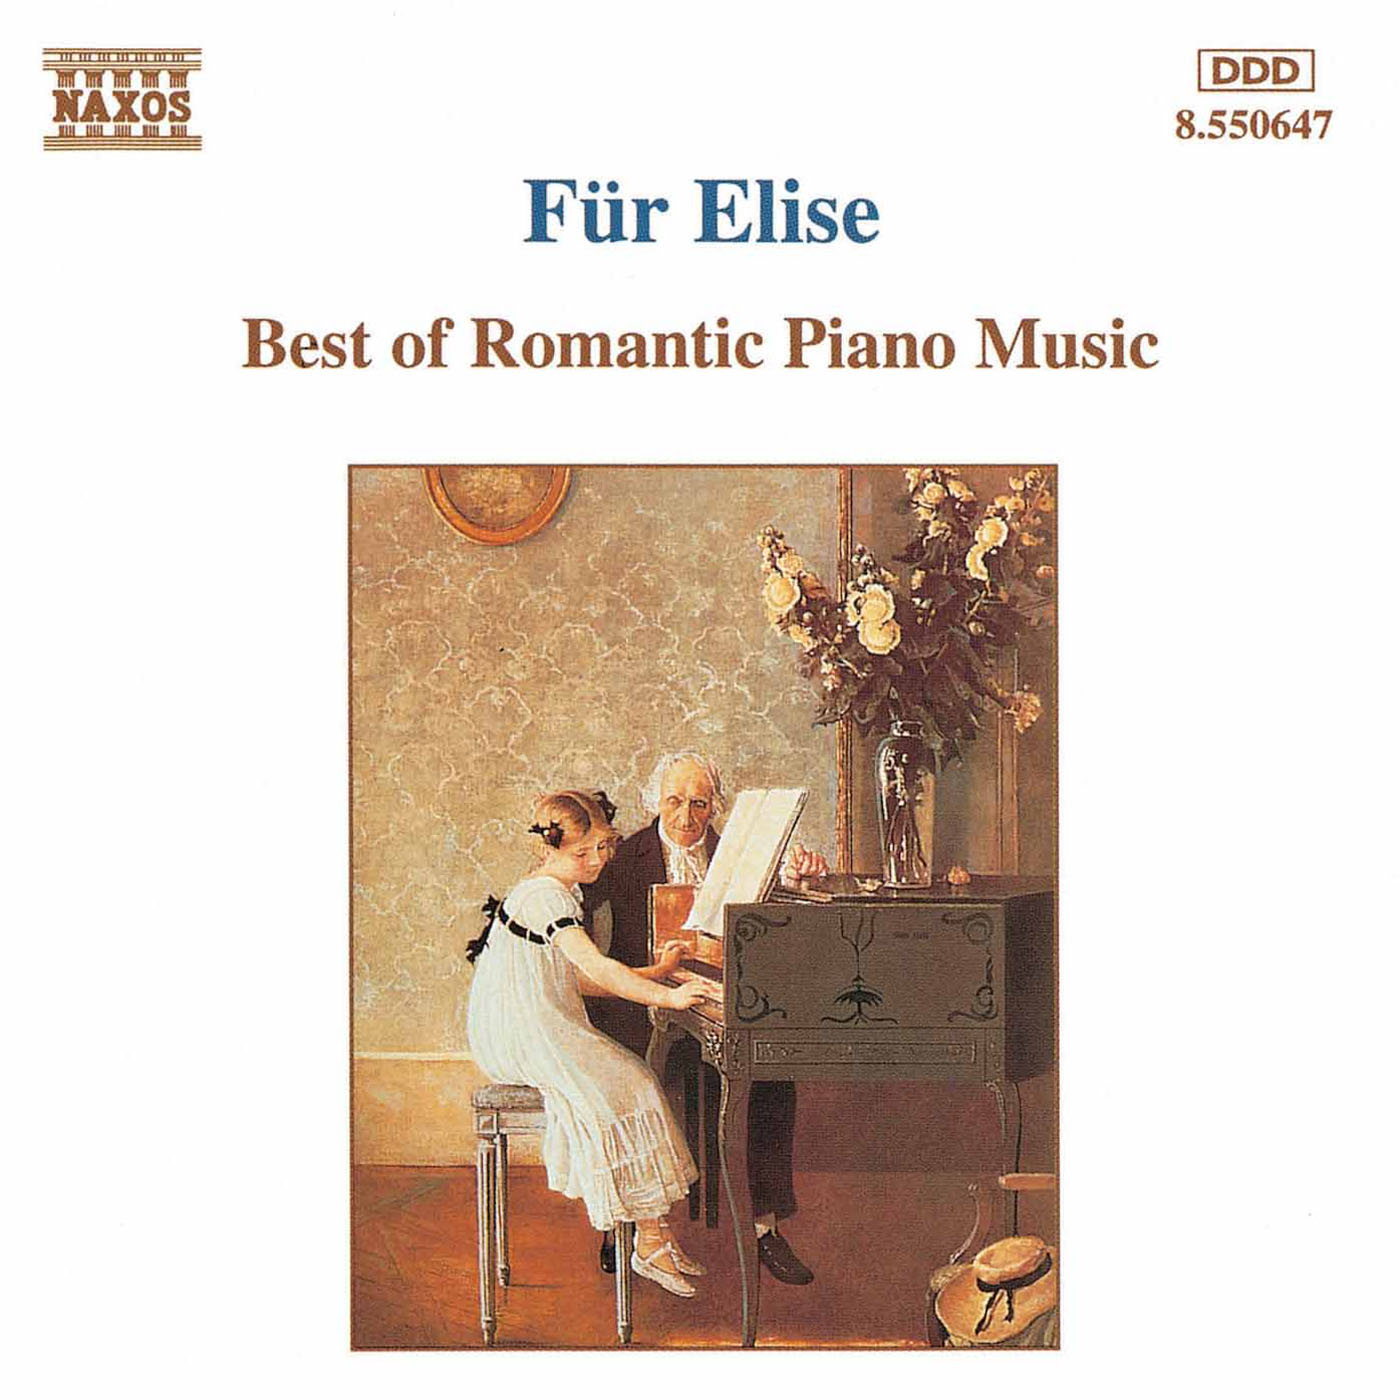 download lagu beethoven fur elise piano mp3